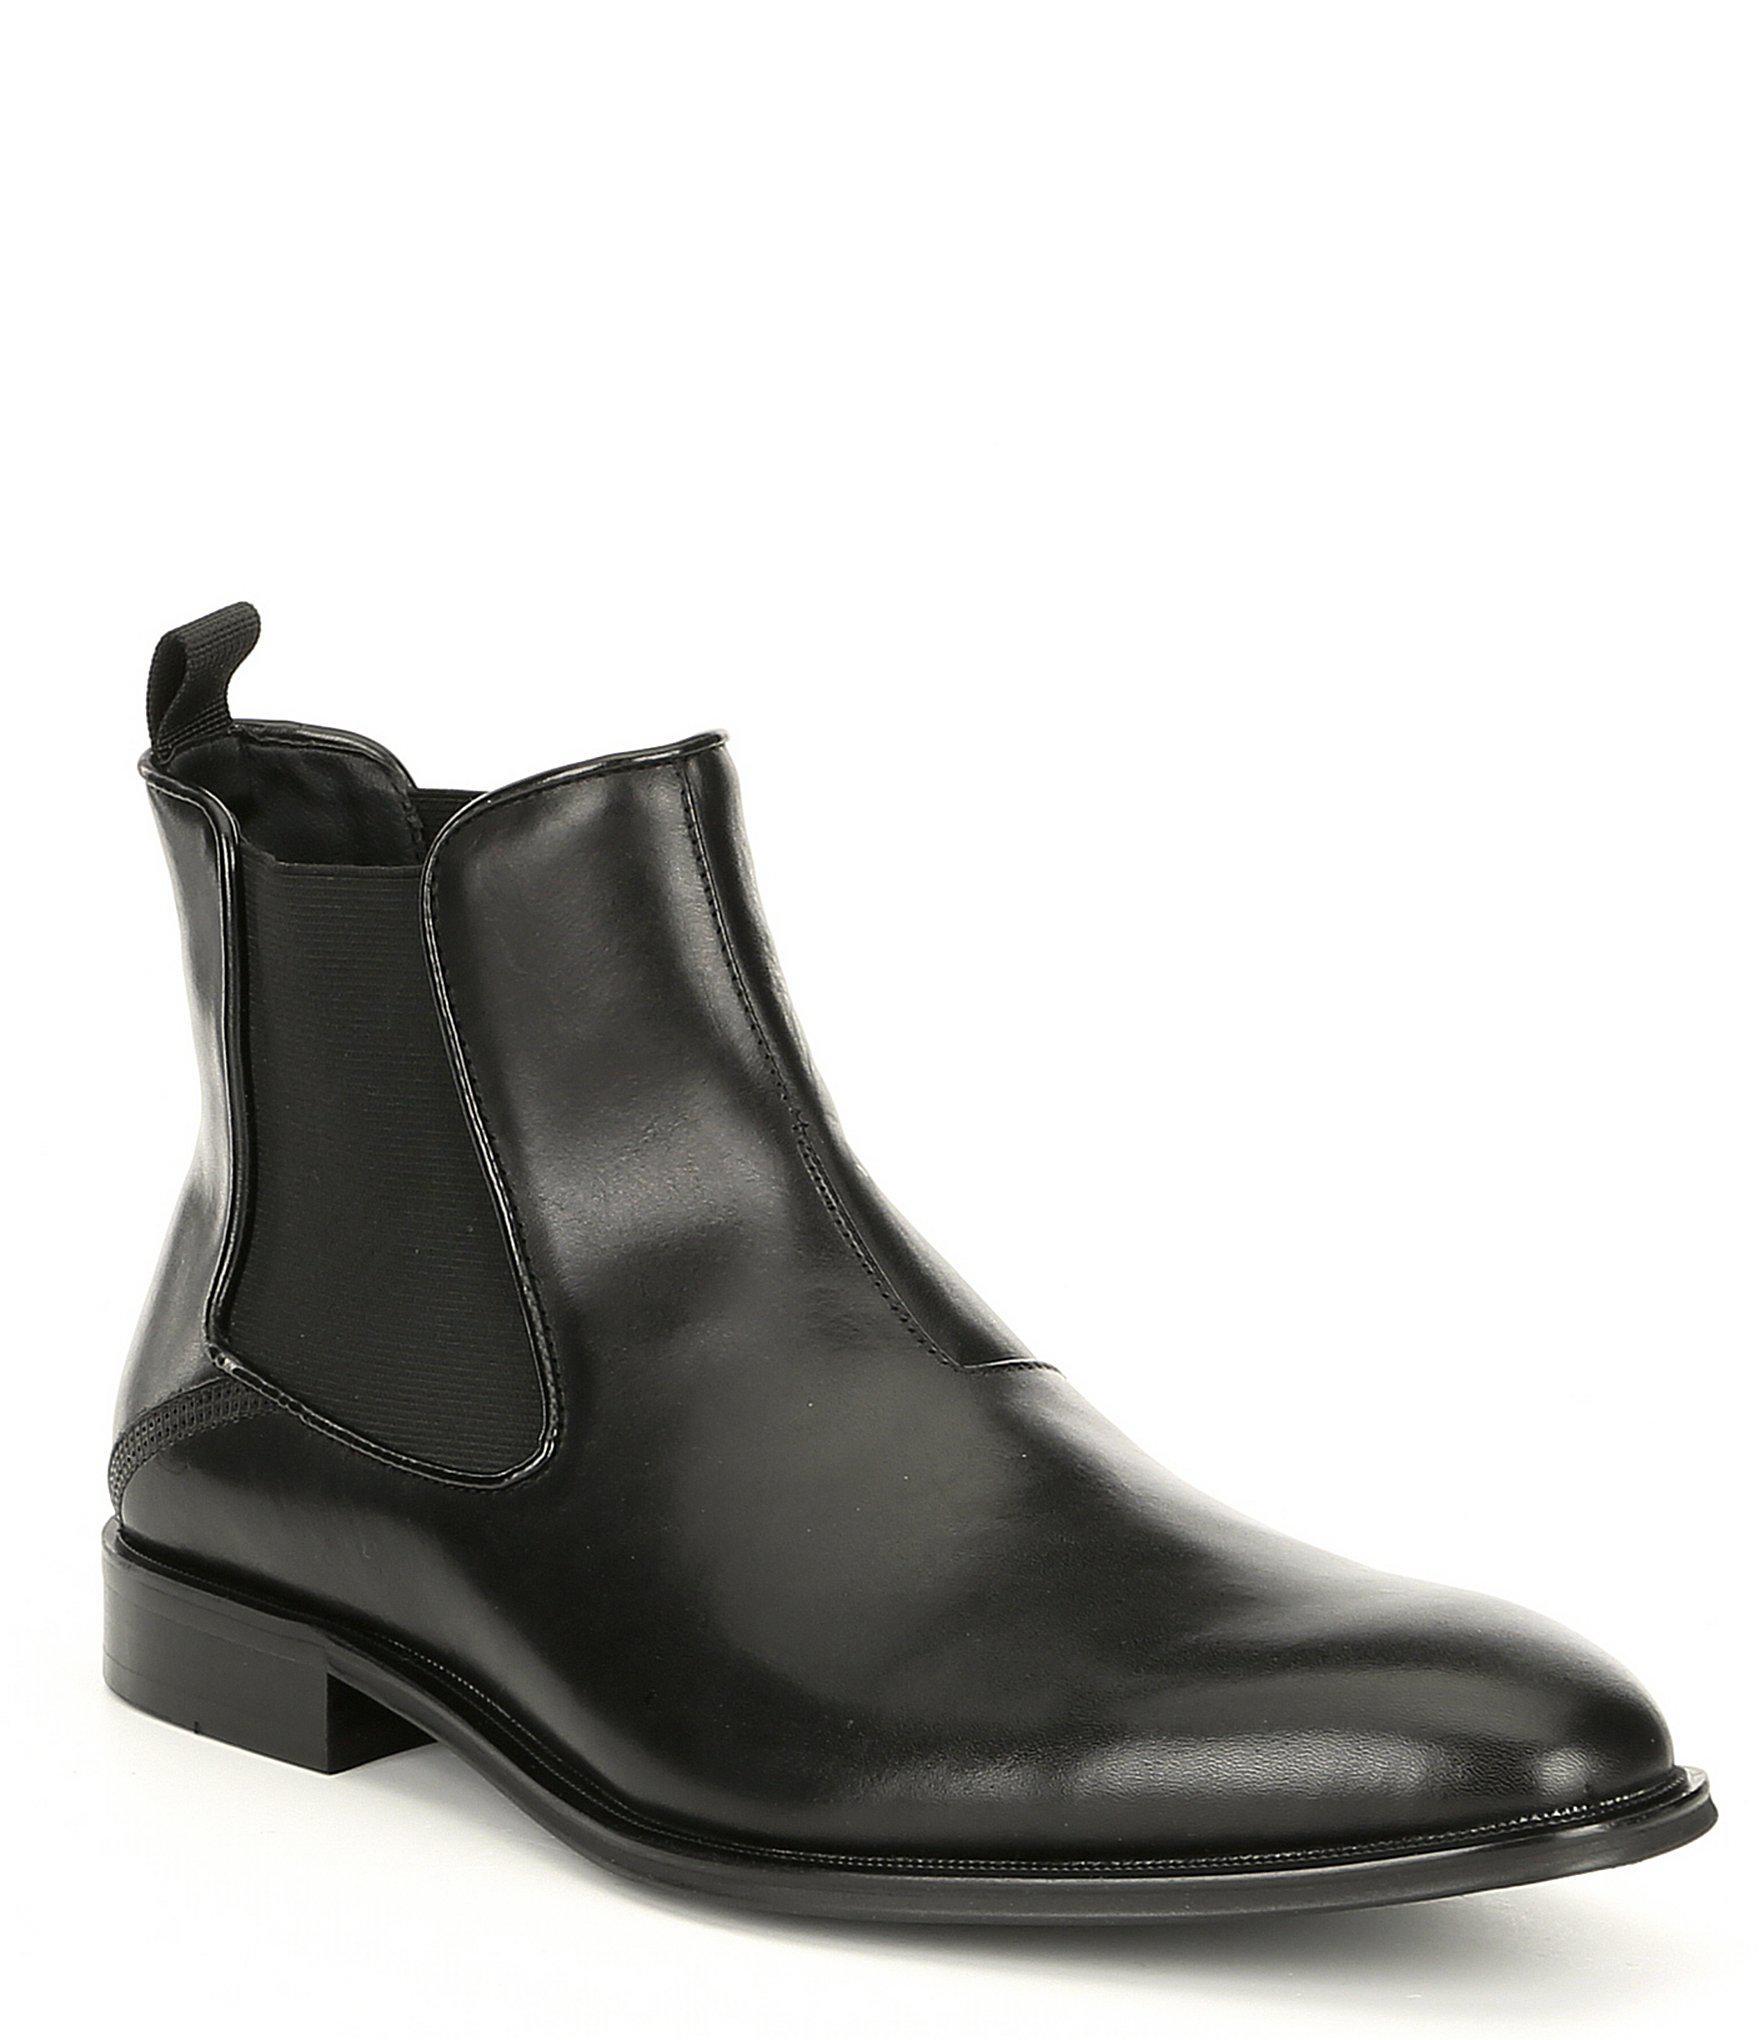 700eb499822 Men's Malice Chelsea Boot